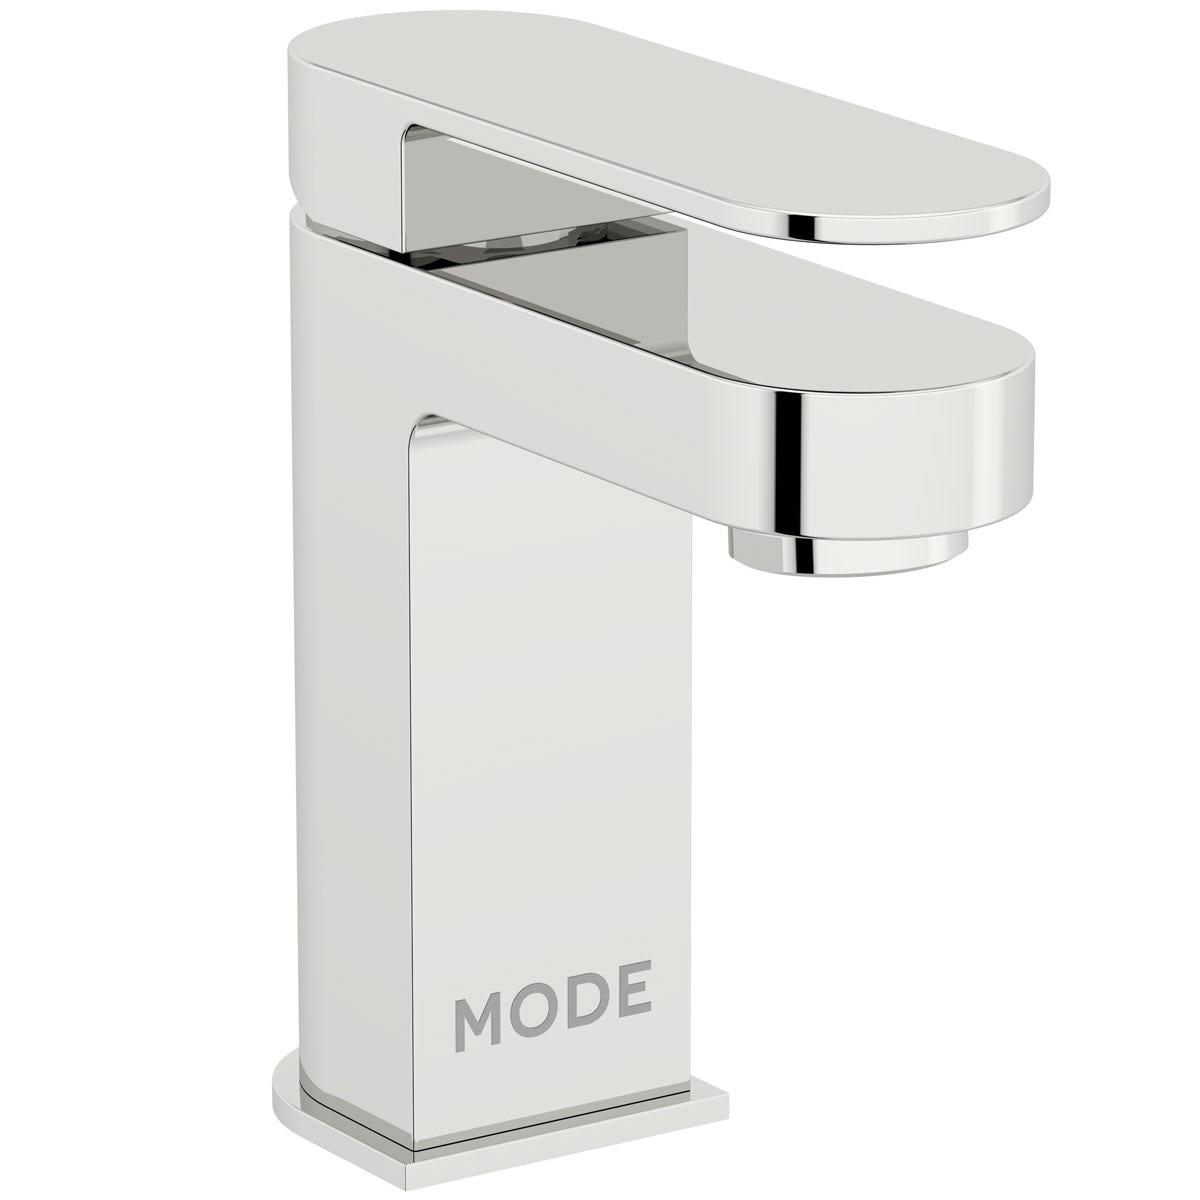 Mode Hardy cloakroom basin mixer tap